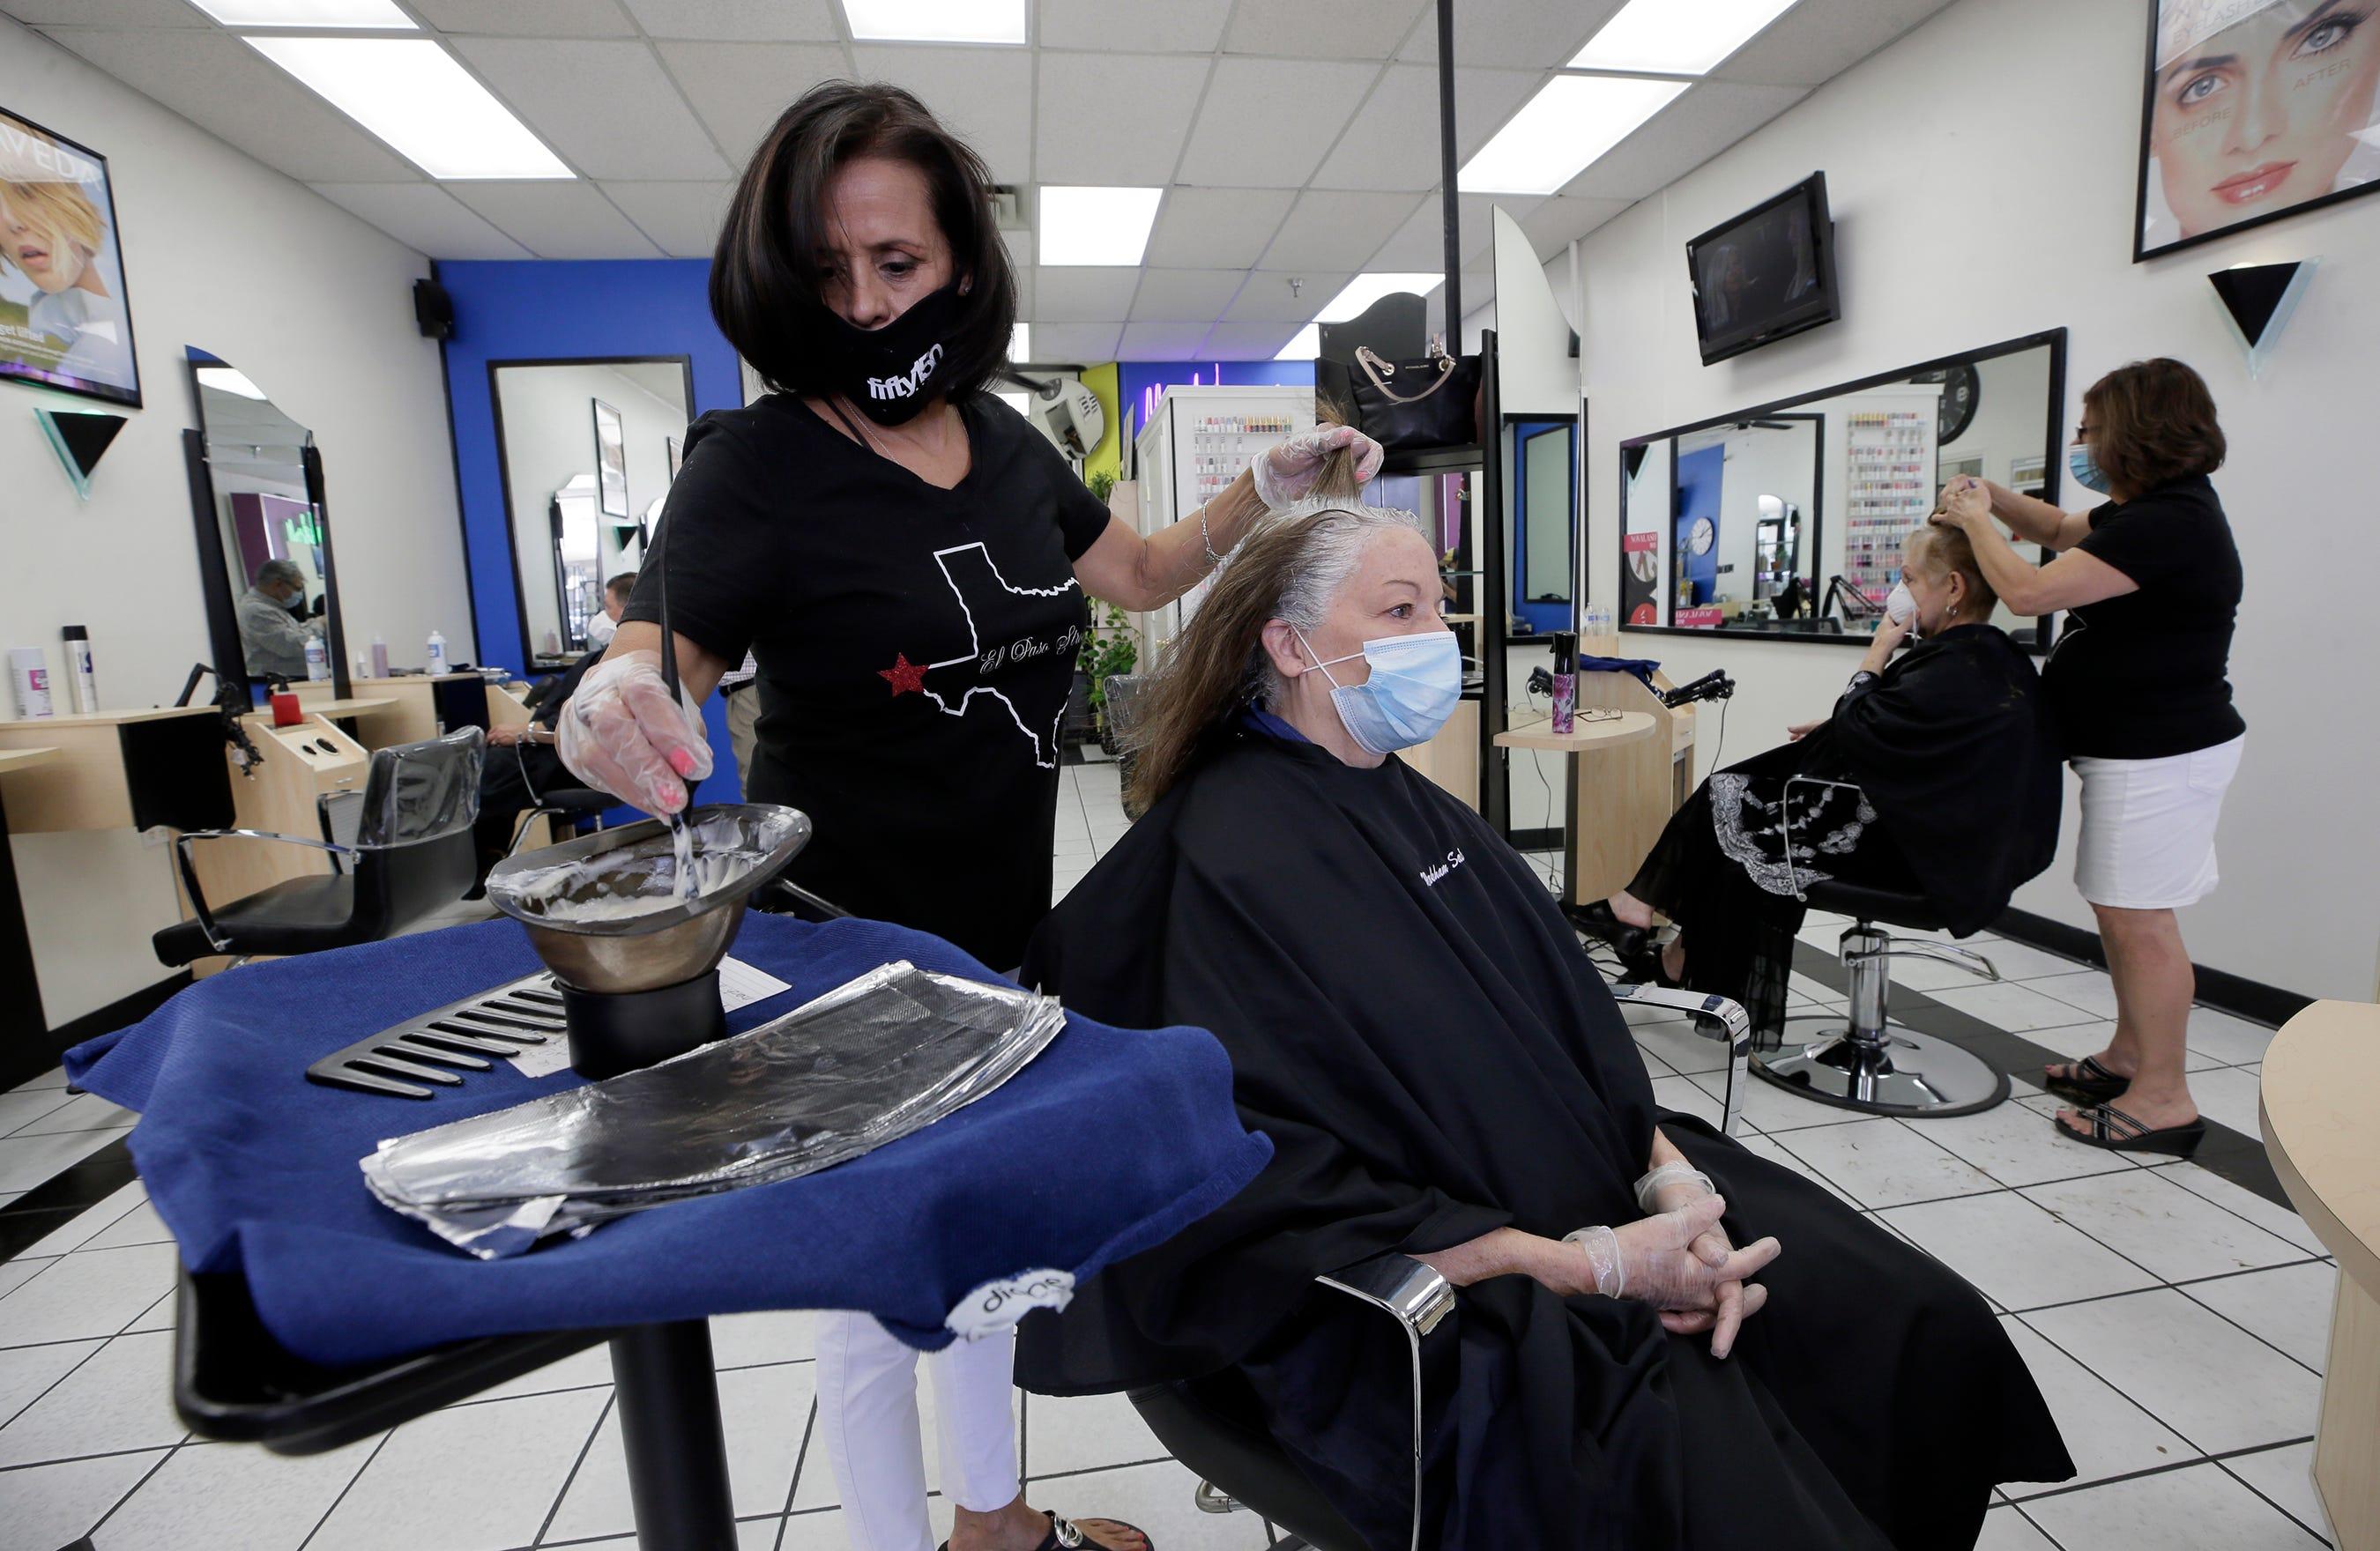 El Paso Hair Salons And Barber Shops Reopen Amid Coronavirus